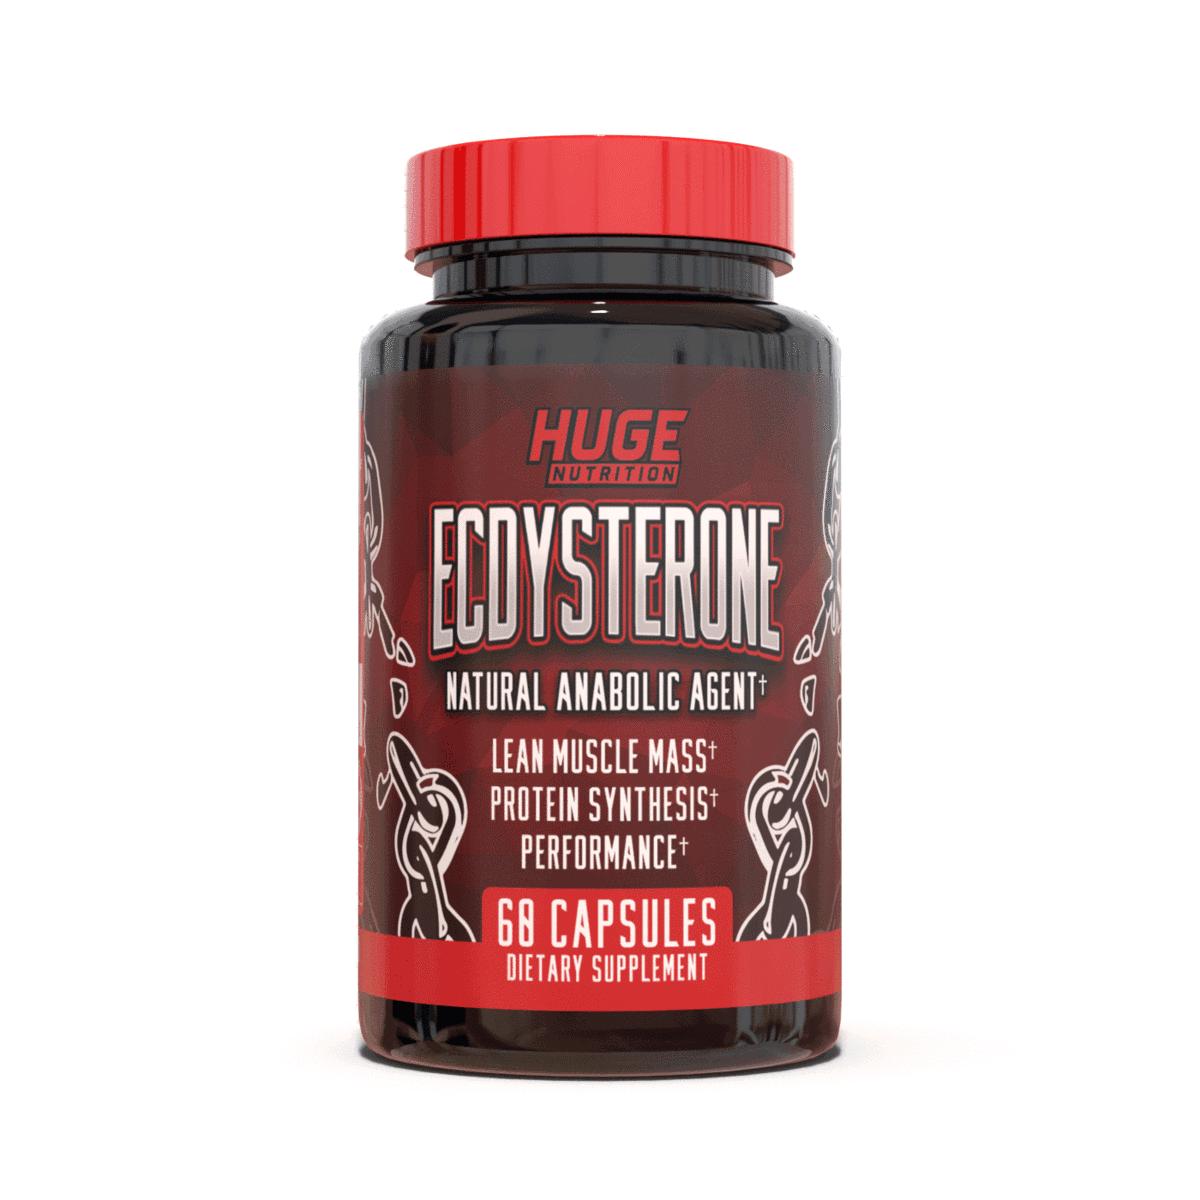 Huge Nutrition Ecdysterone (30 Servings)